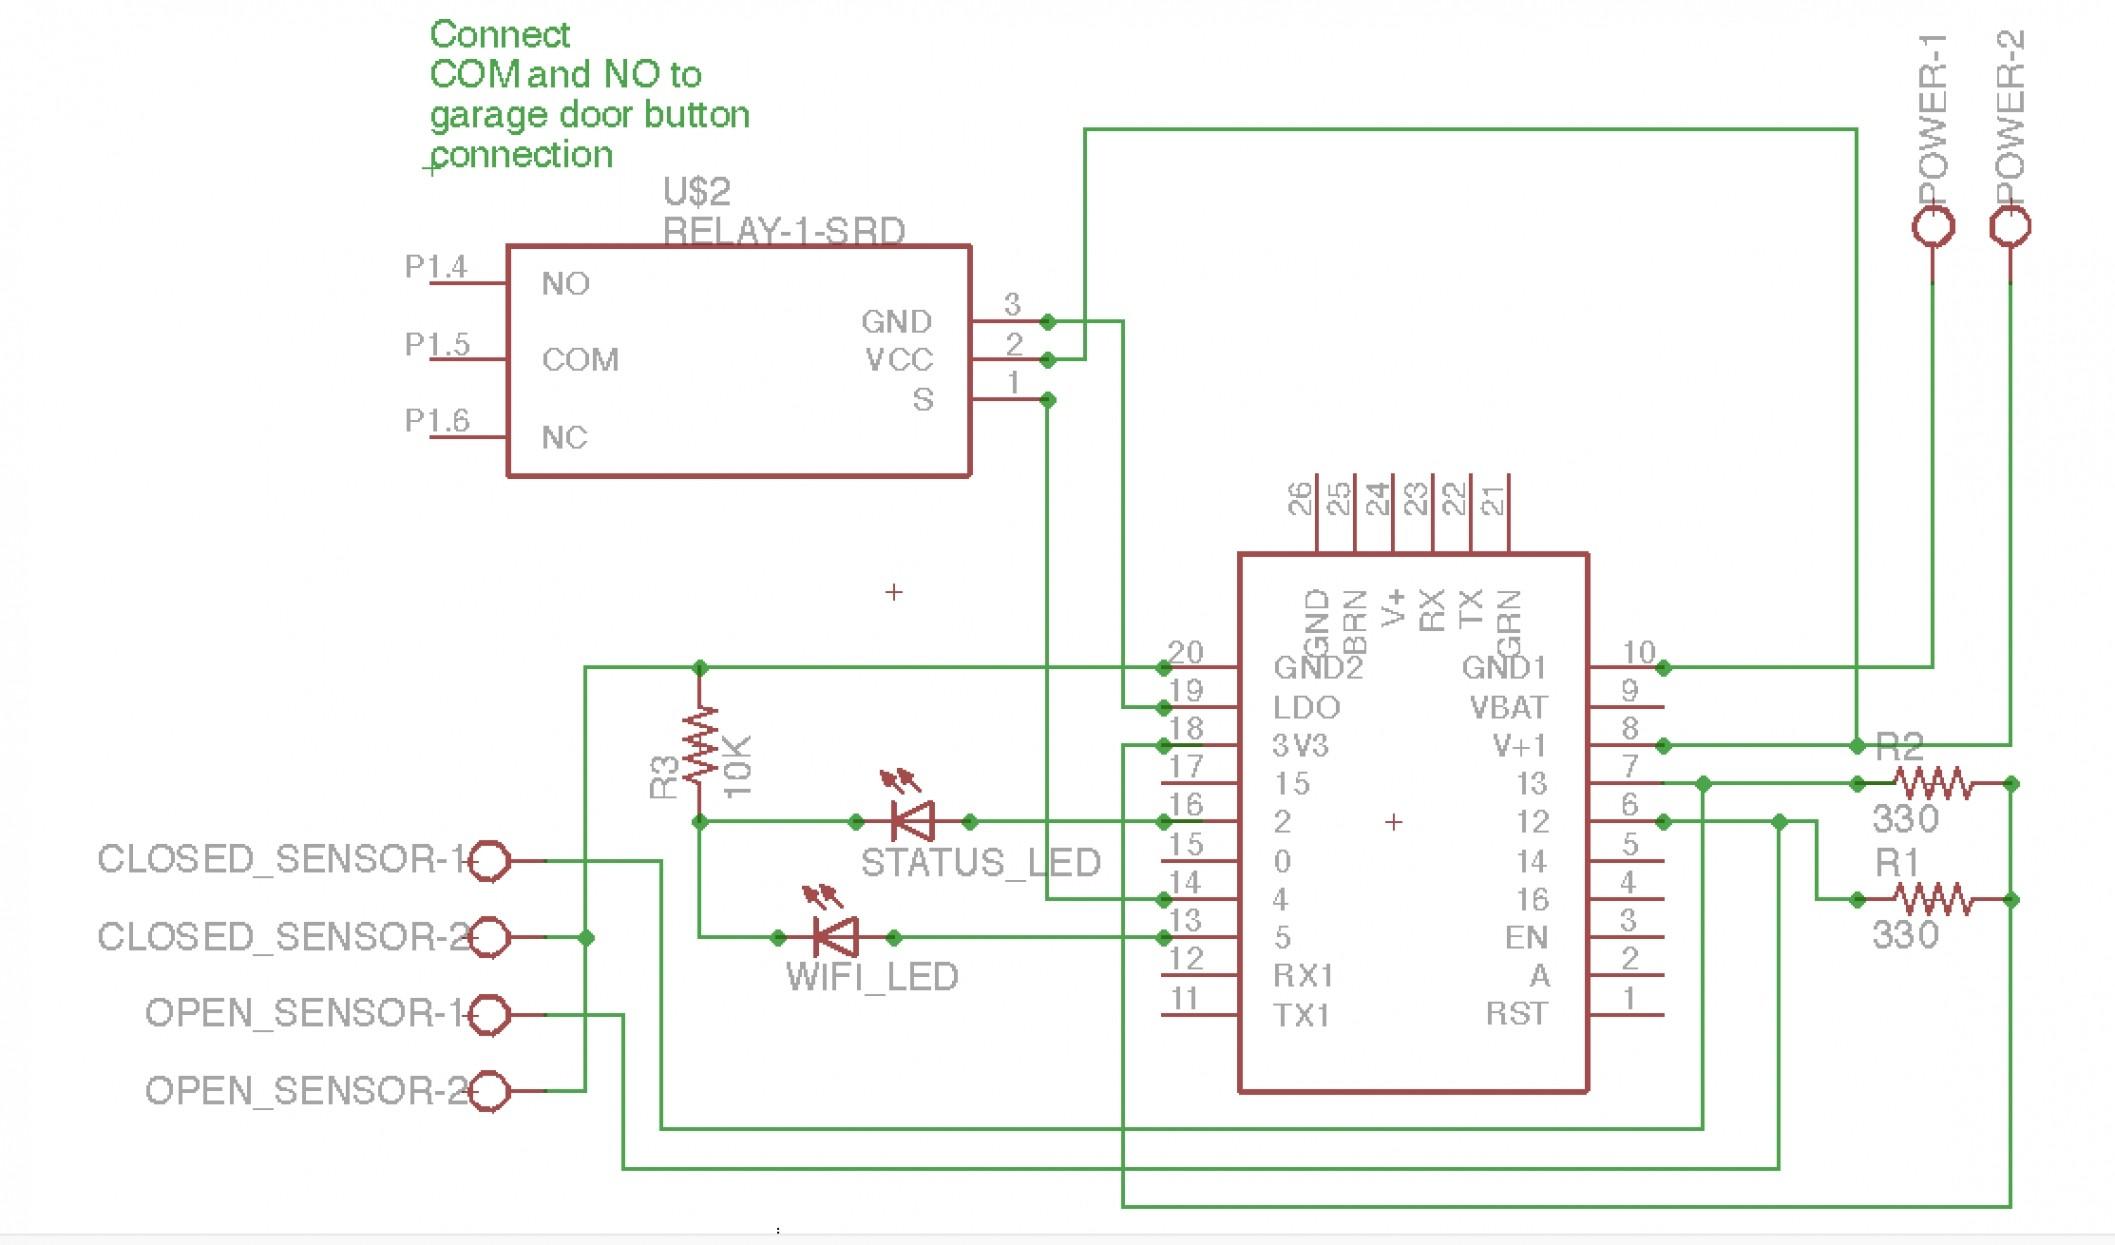 Wiring Diagram for Garage Door Opener Garage Door Sensor Wiring Diagramenie Craftsman Safety Diagram Of Wiring Diagram for Garage Door Opener